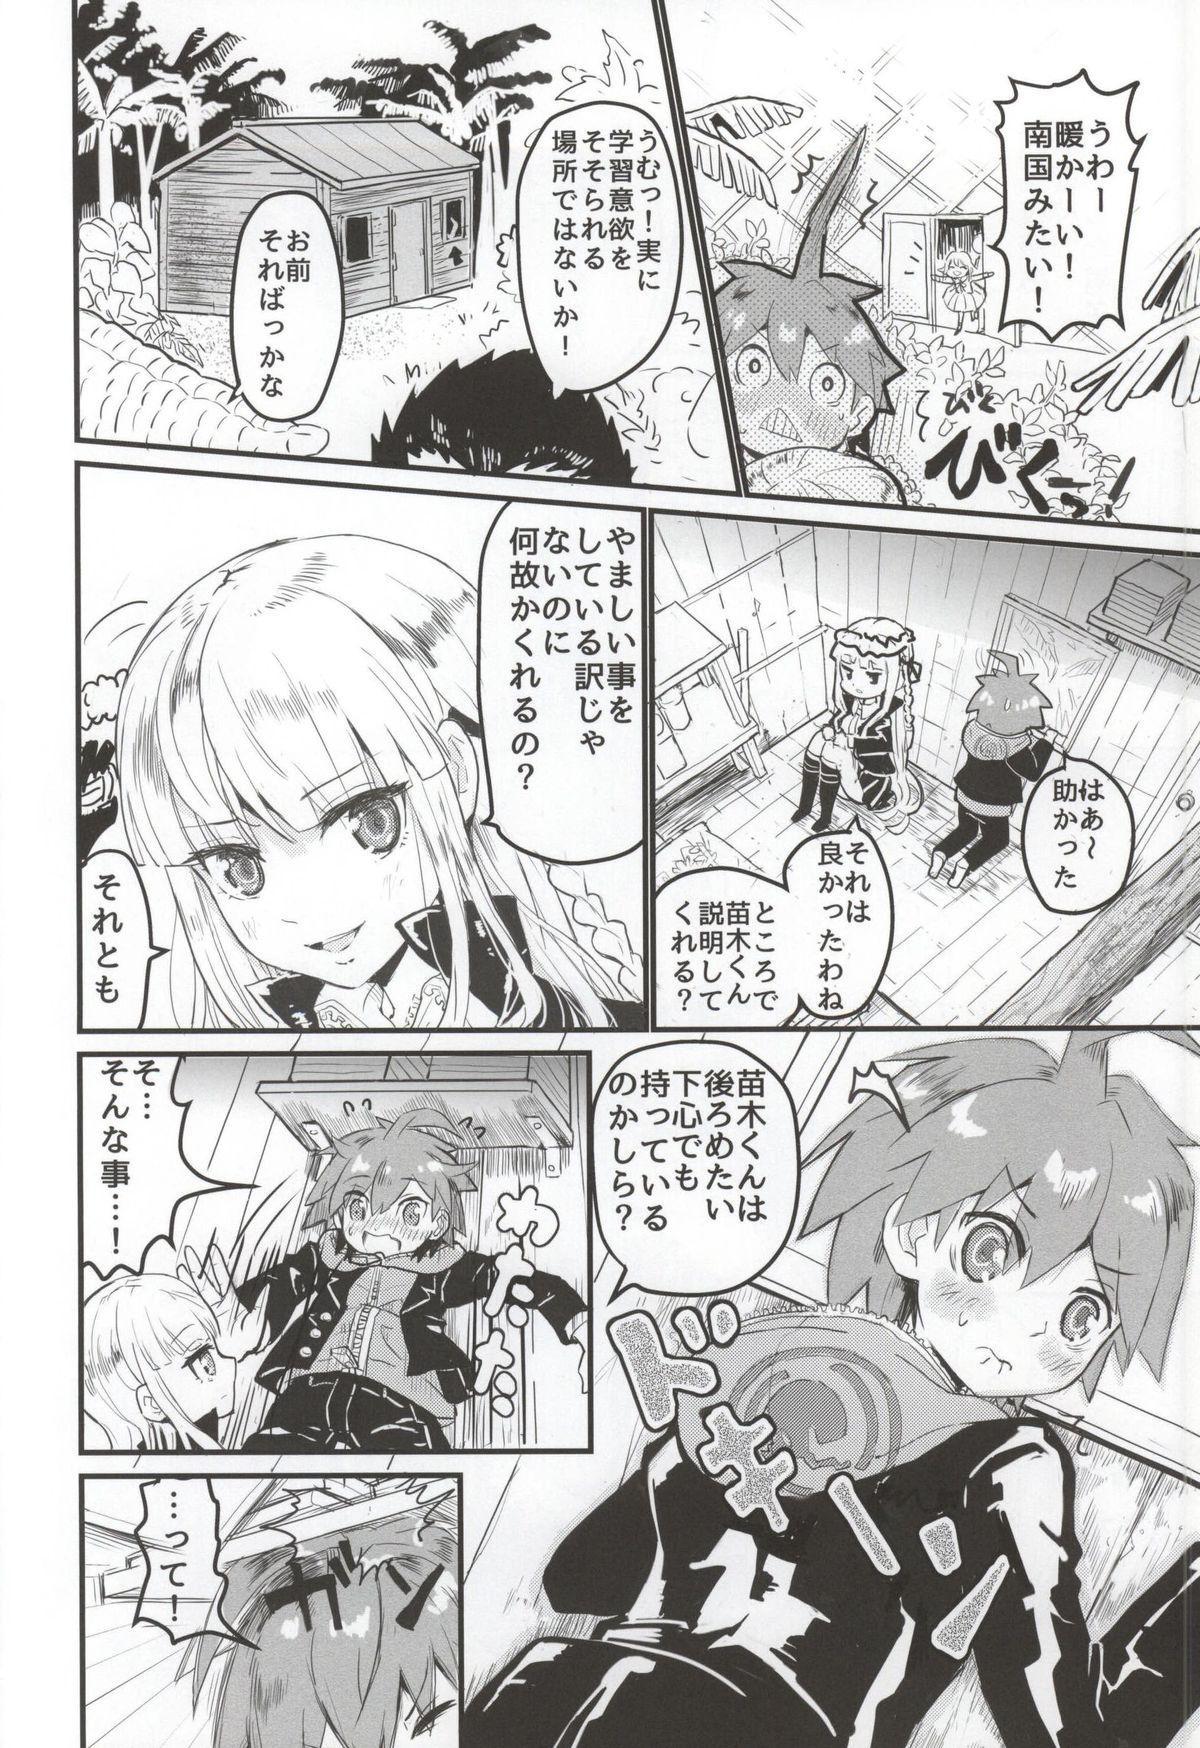 Kirigiri-san to Issho ni School Mode 6